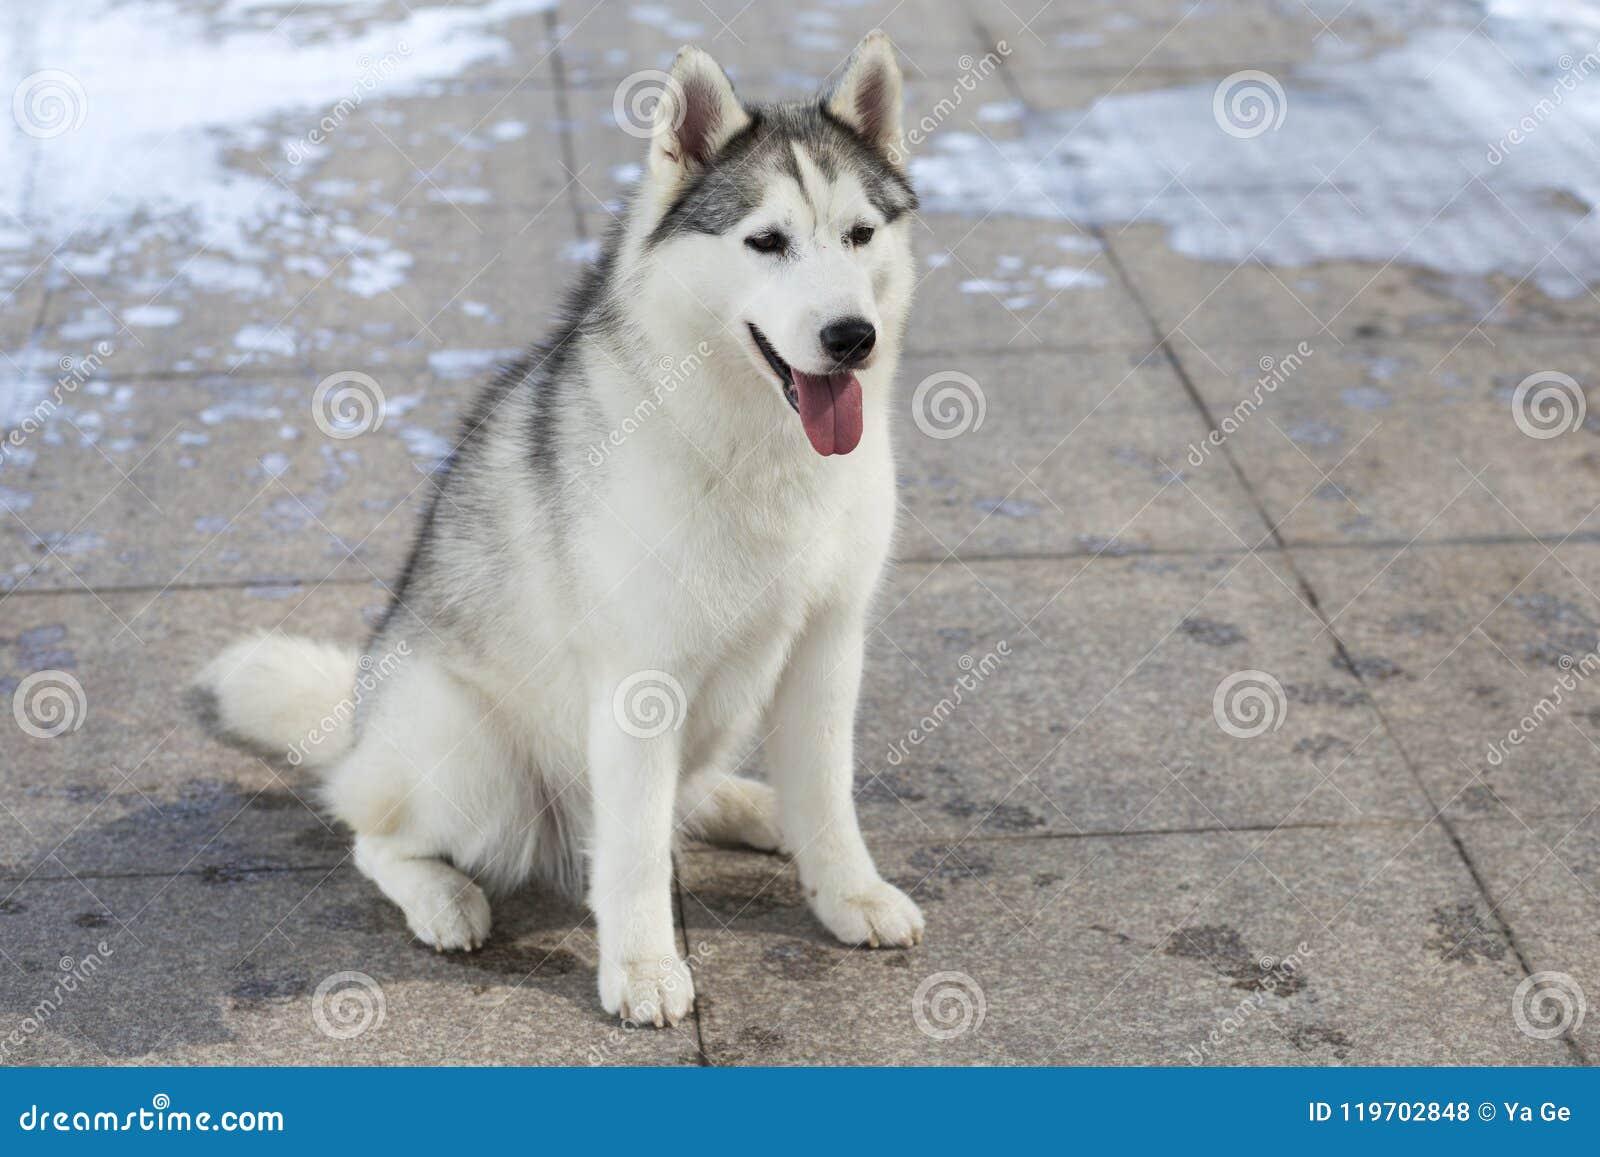 Siberian Husky Dog Stock Photo Image Of Outdoors Grass 119702848